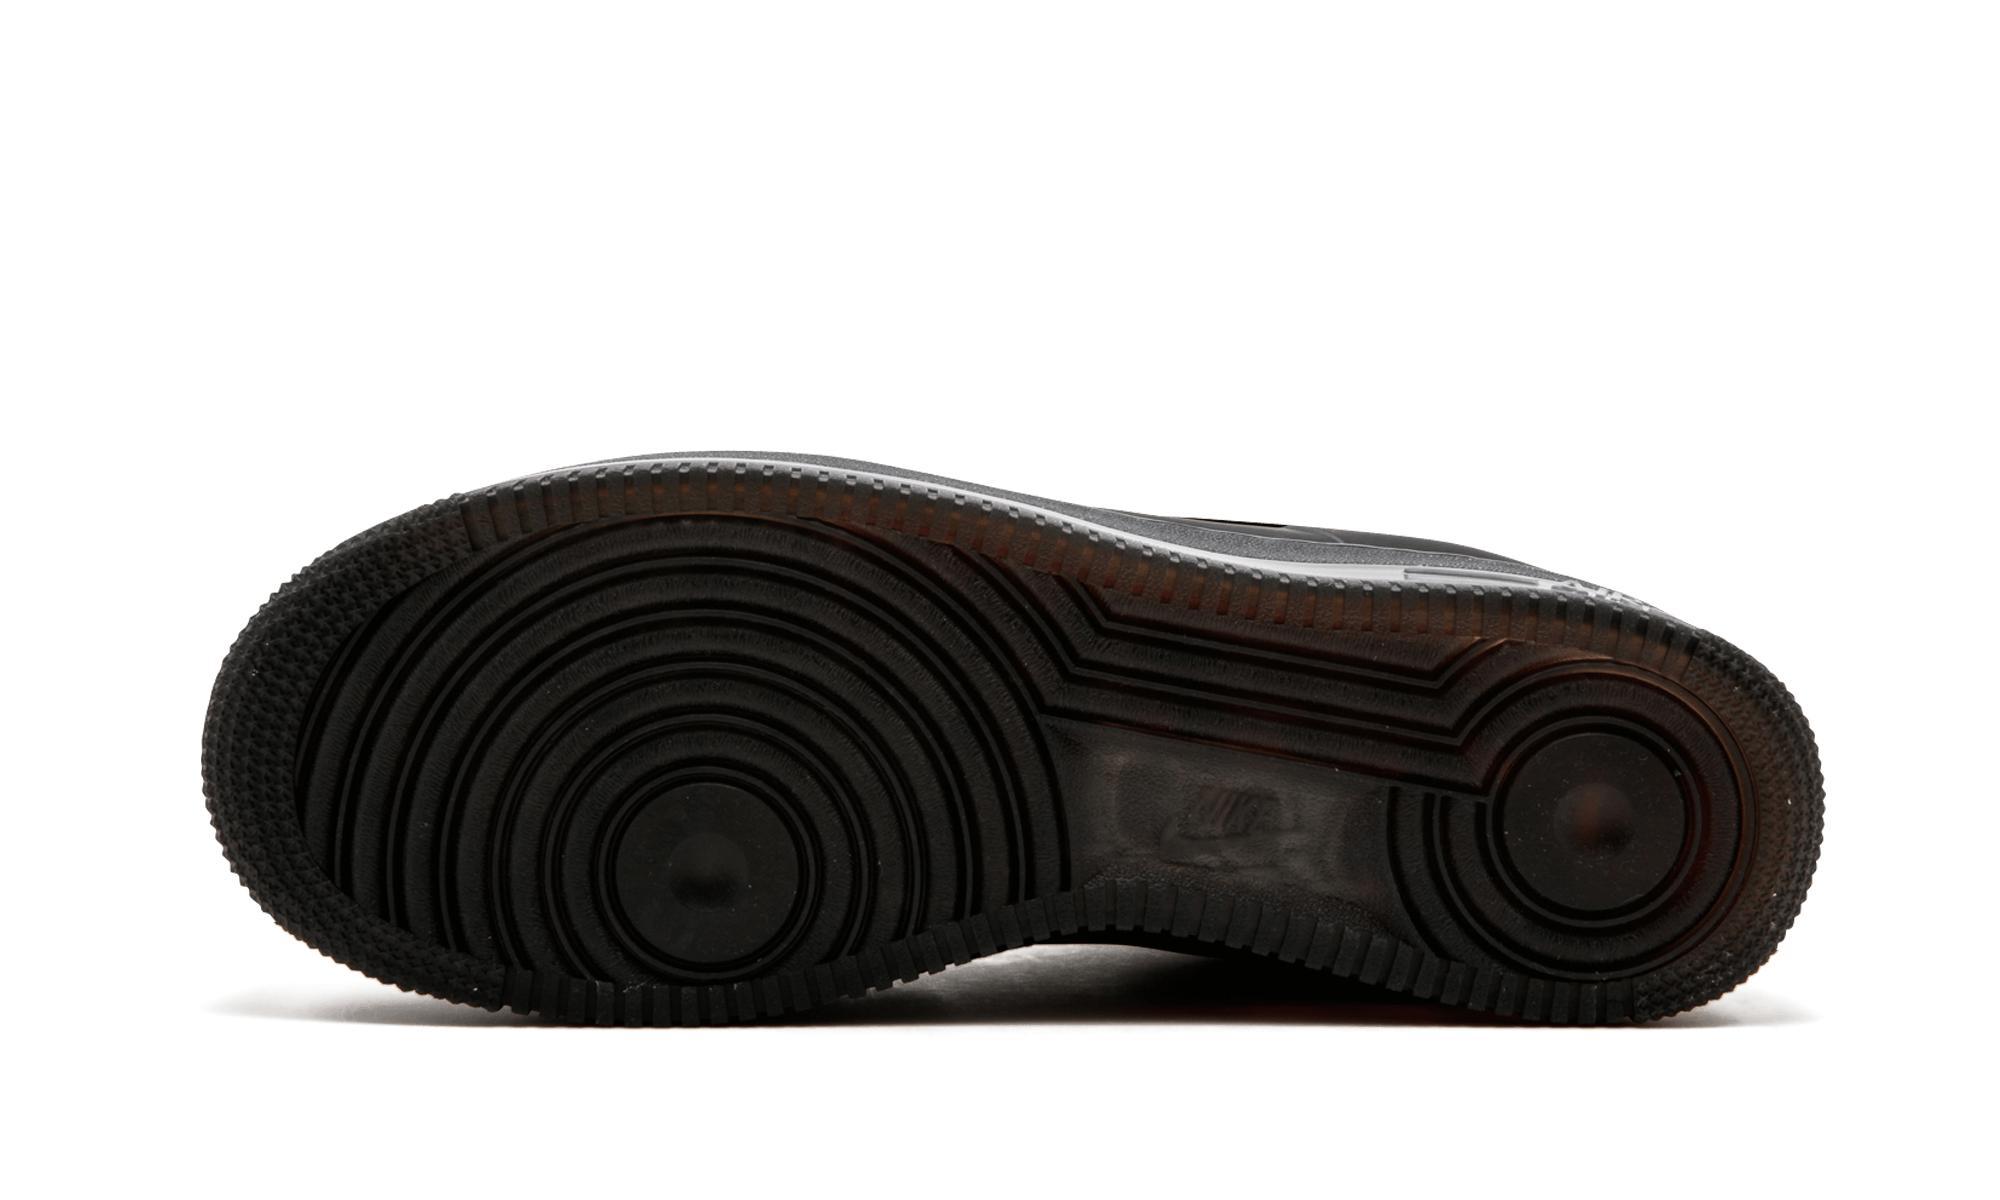 cc4cdcfa55430 Lyst - Nike Air Force 1 Posite Fl Max Qs in Black for Men